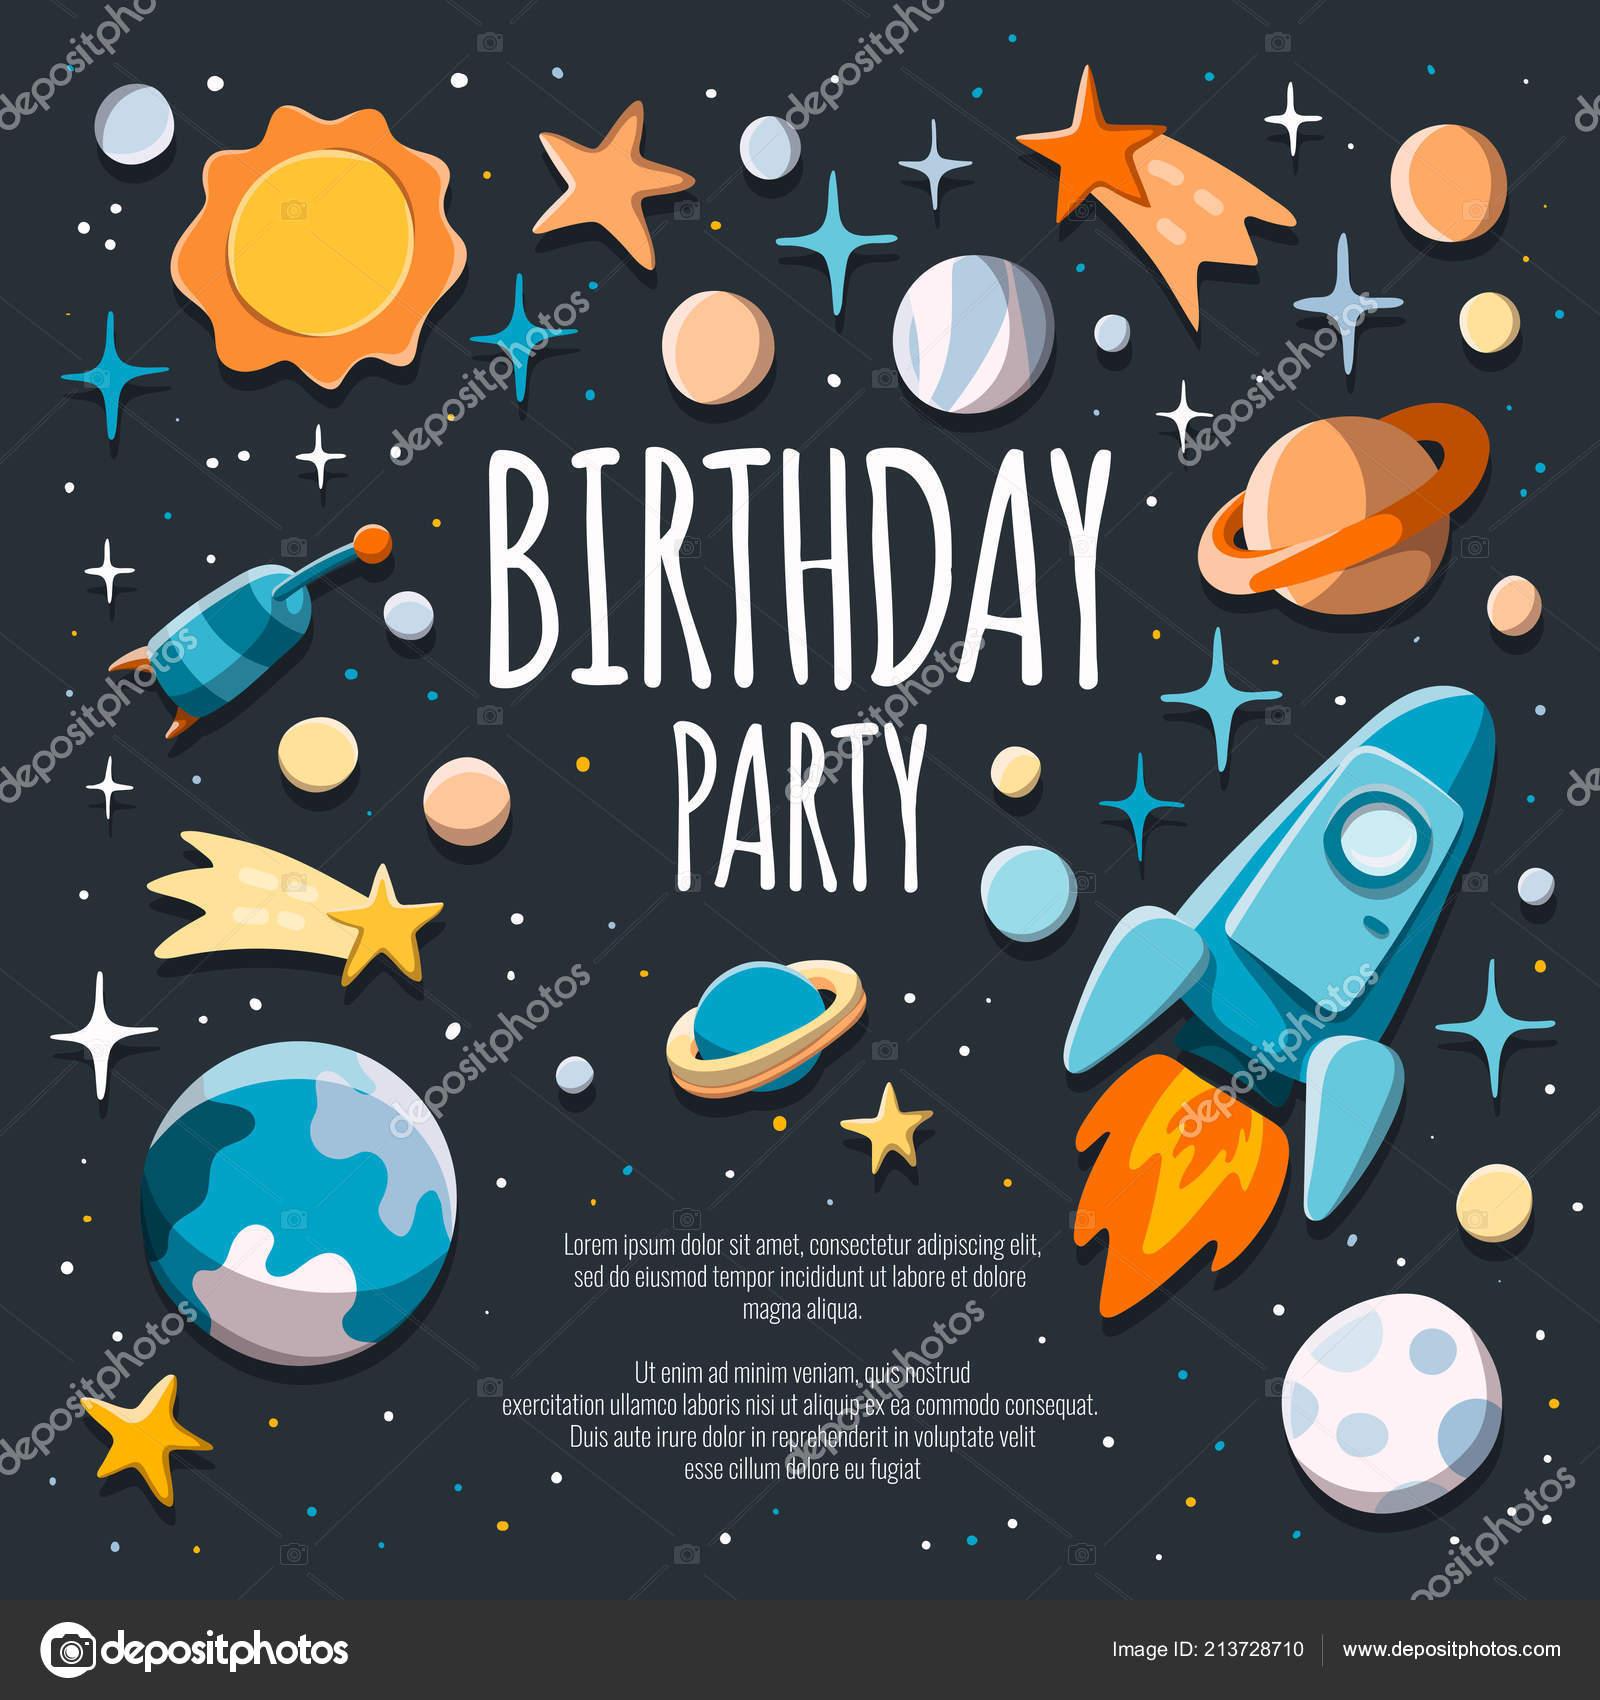 https depositphotos com 213728710 stock illustration birthday party invitation flyer poster html